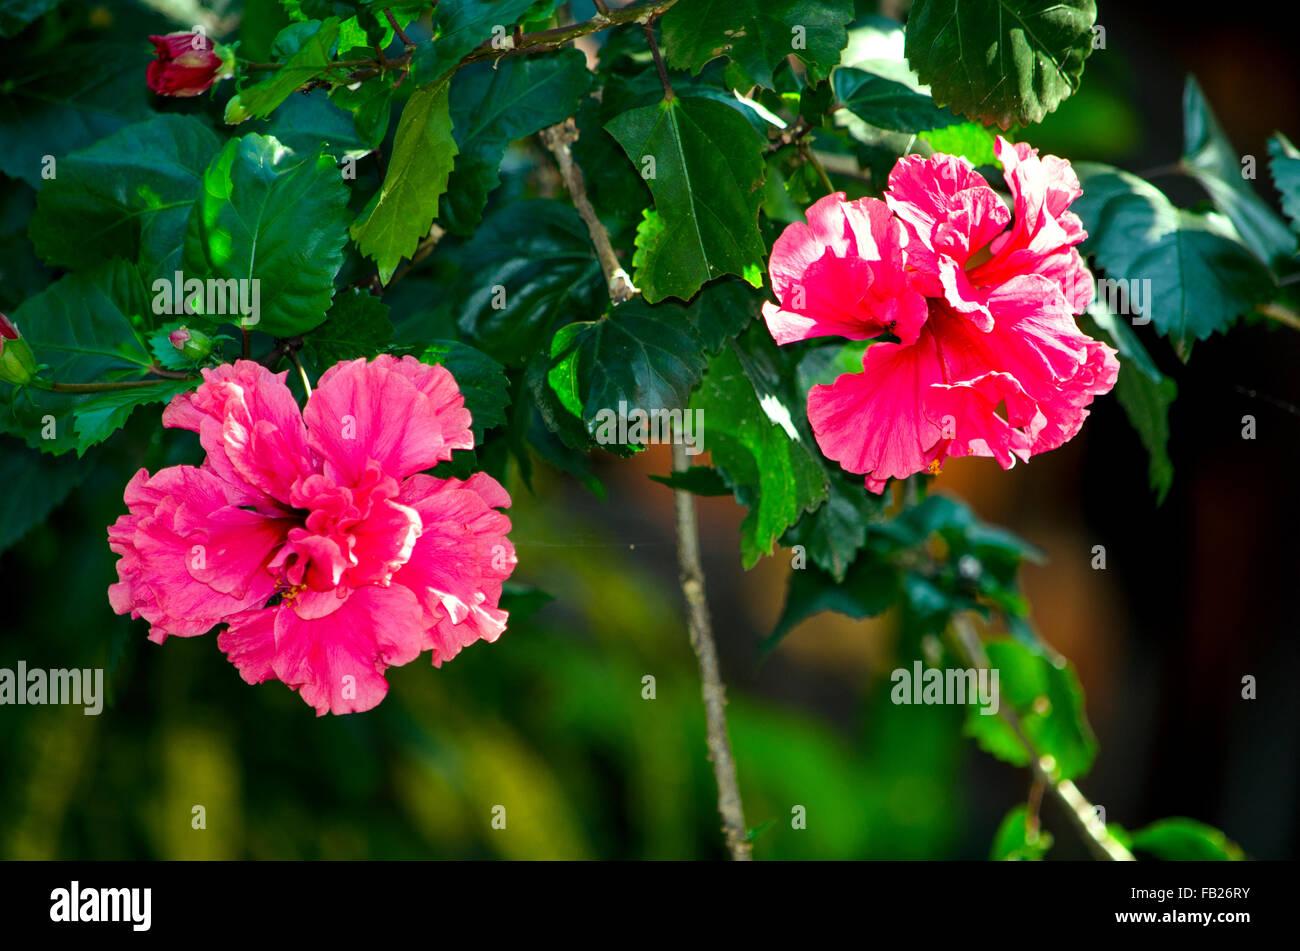 A hibiscus plant stock photos a hibiscus plant stock images alamy flower a hibiscus a plant of asiaa flowera hibiscusa ktiaysky izmirmasajfo